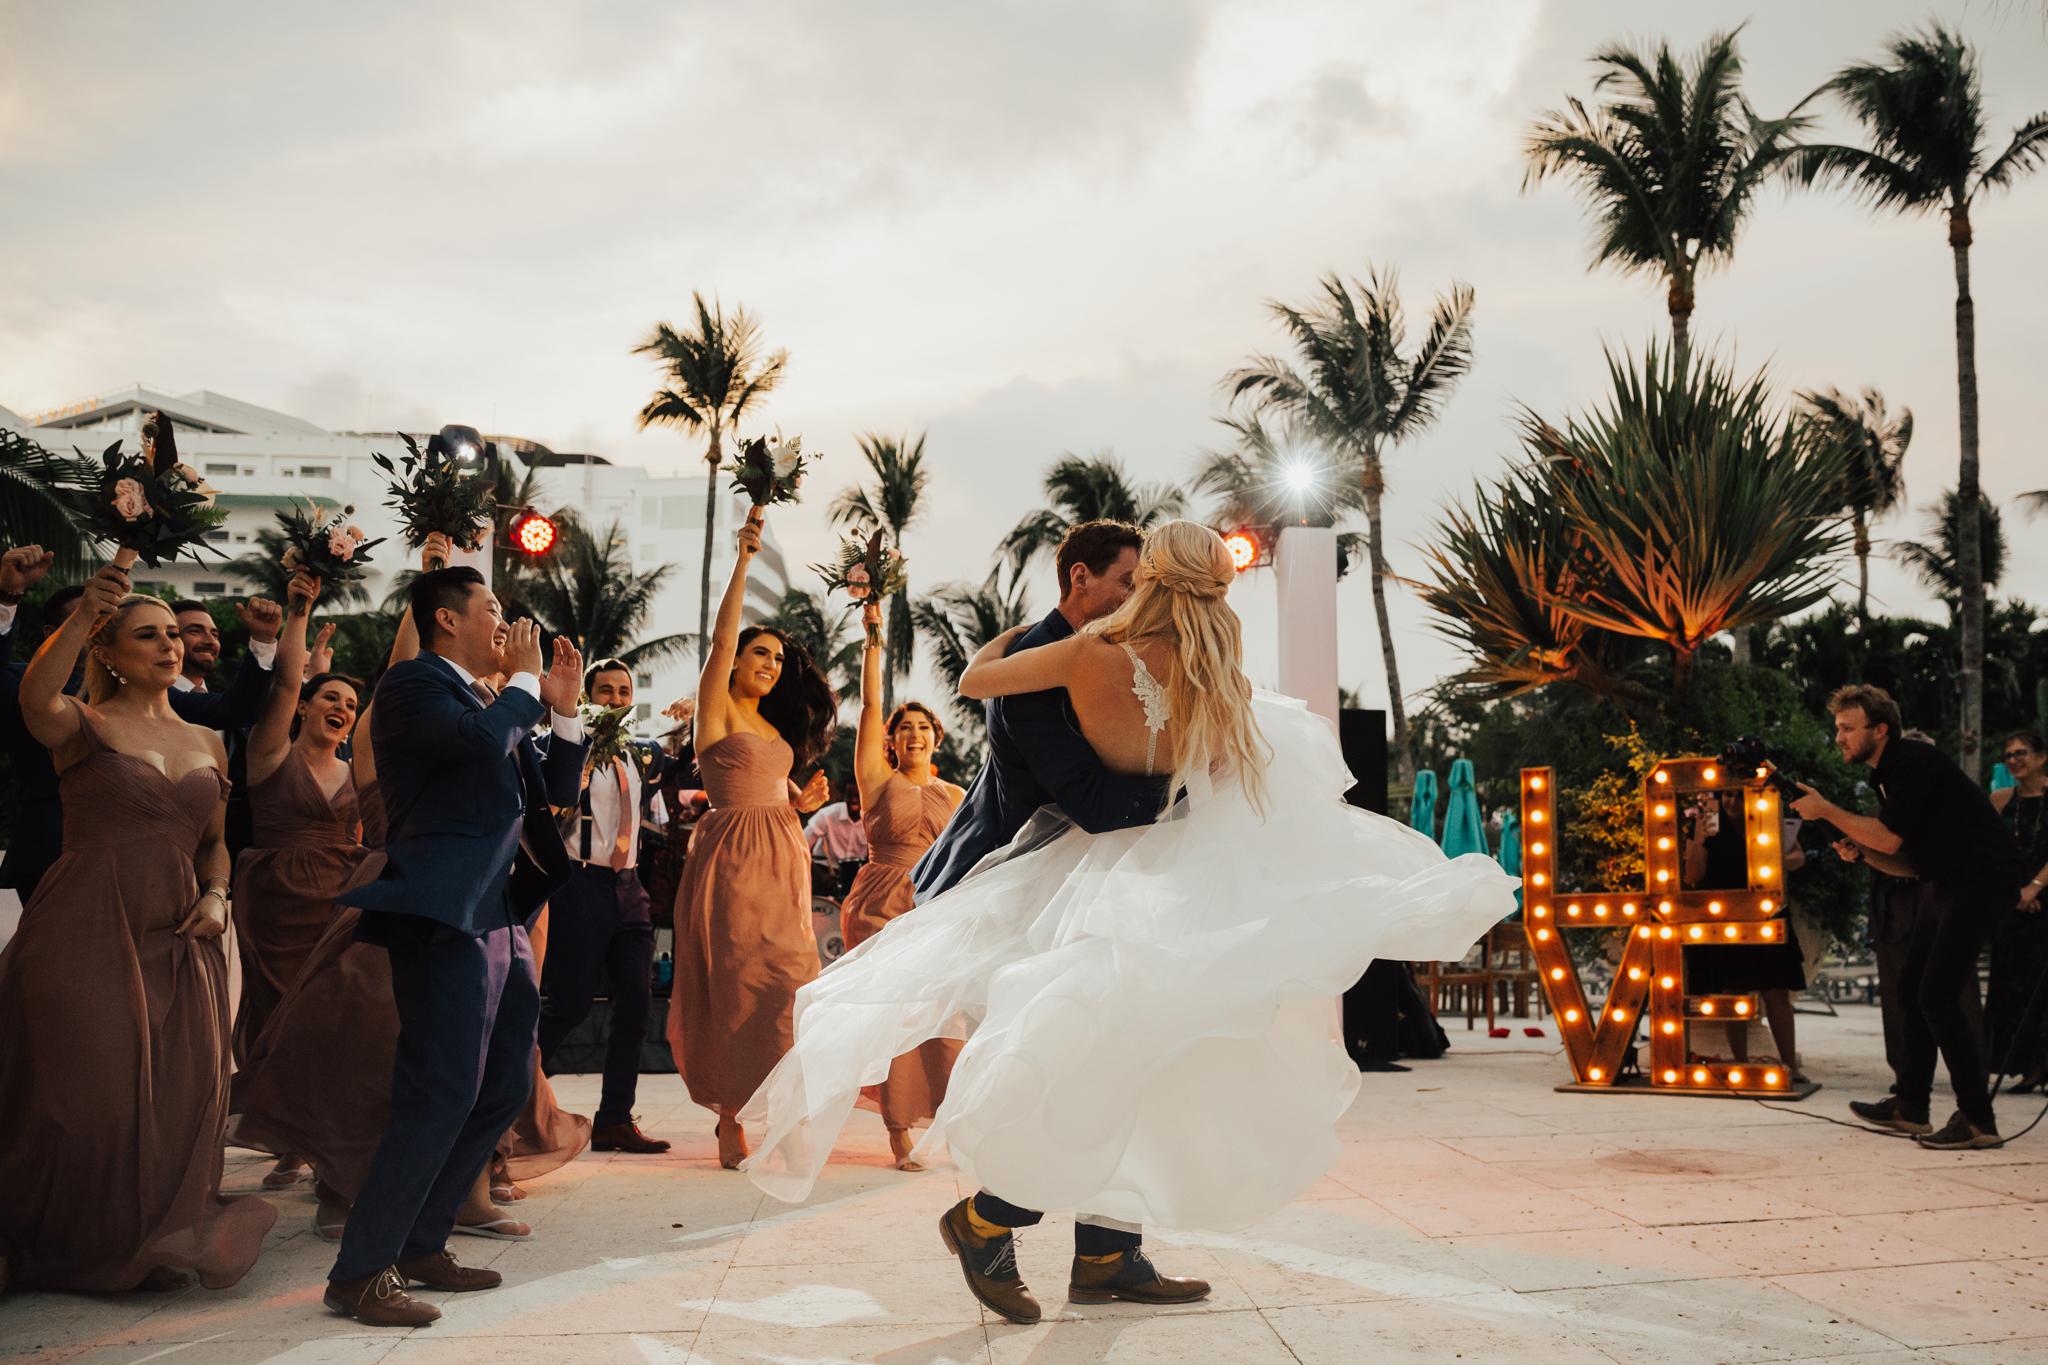 miami_wedding-151.jpg